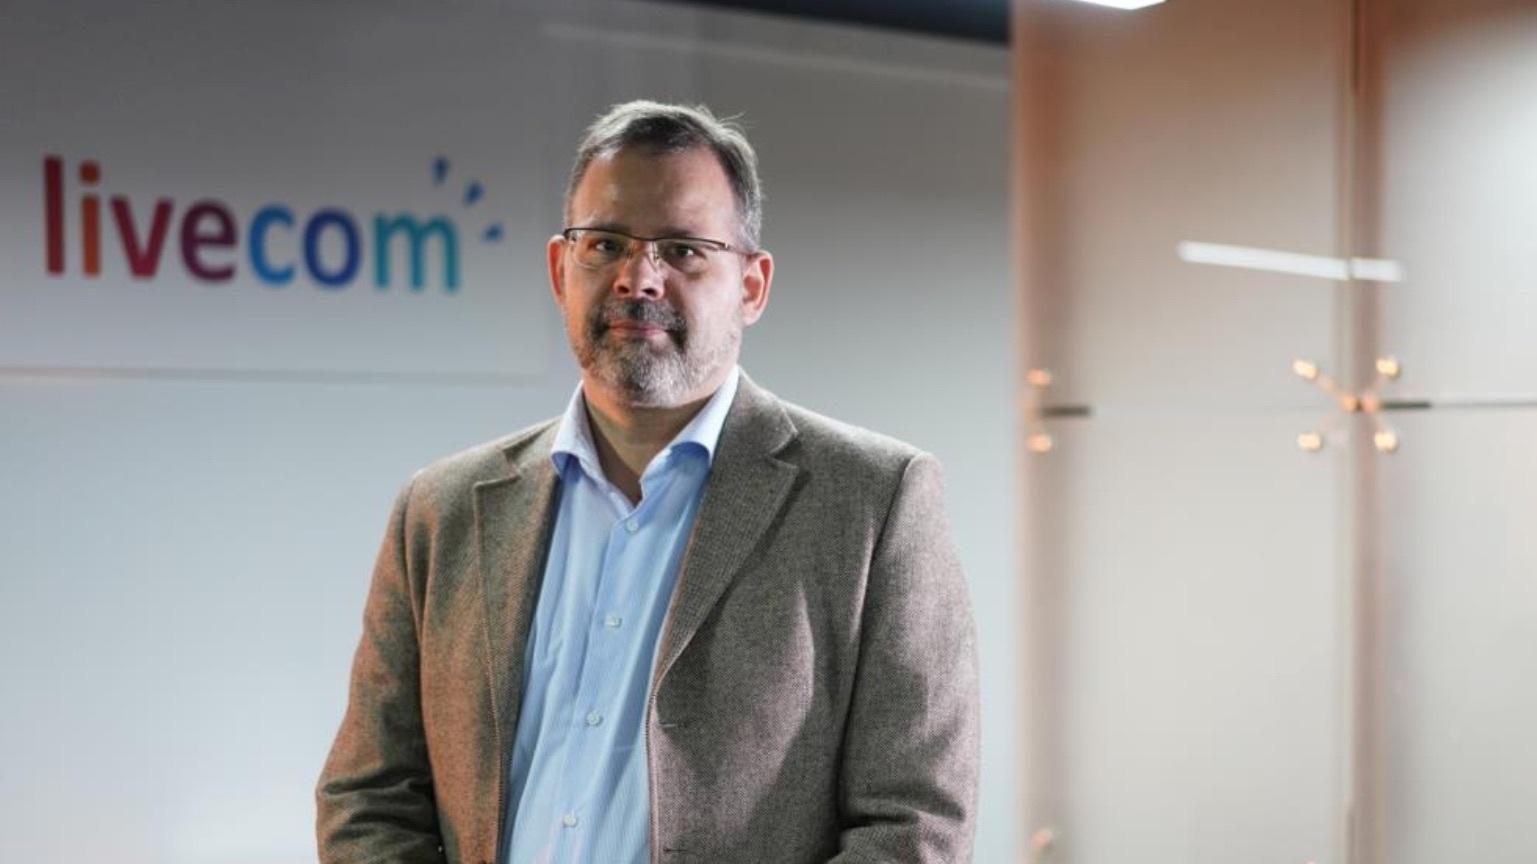 Meet our customers - Read Livecom's story: how Megi enabled cross-border teams